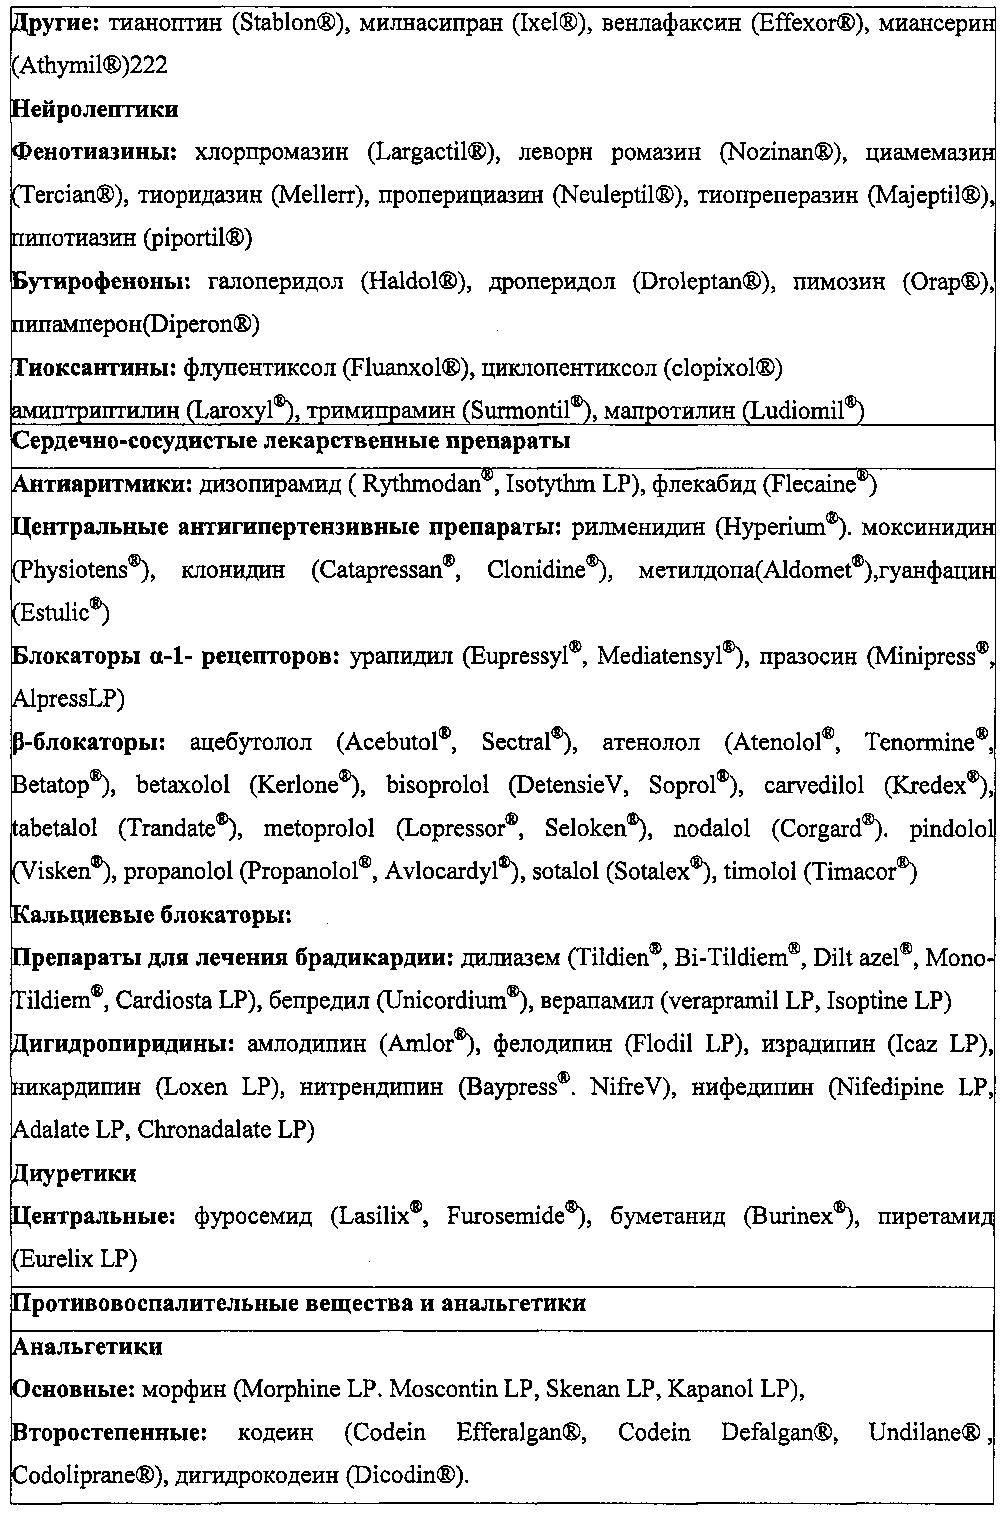 Моклобемид